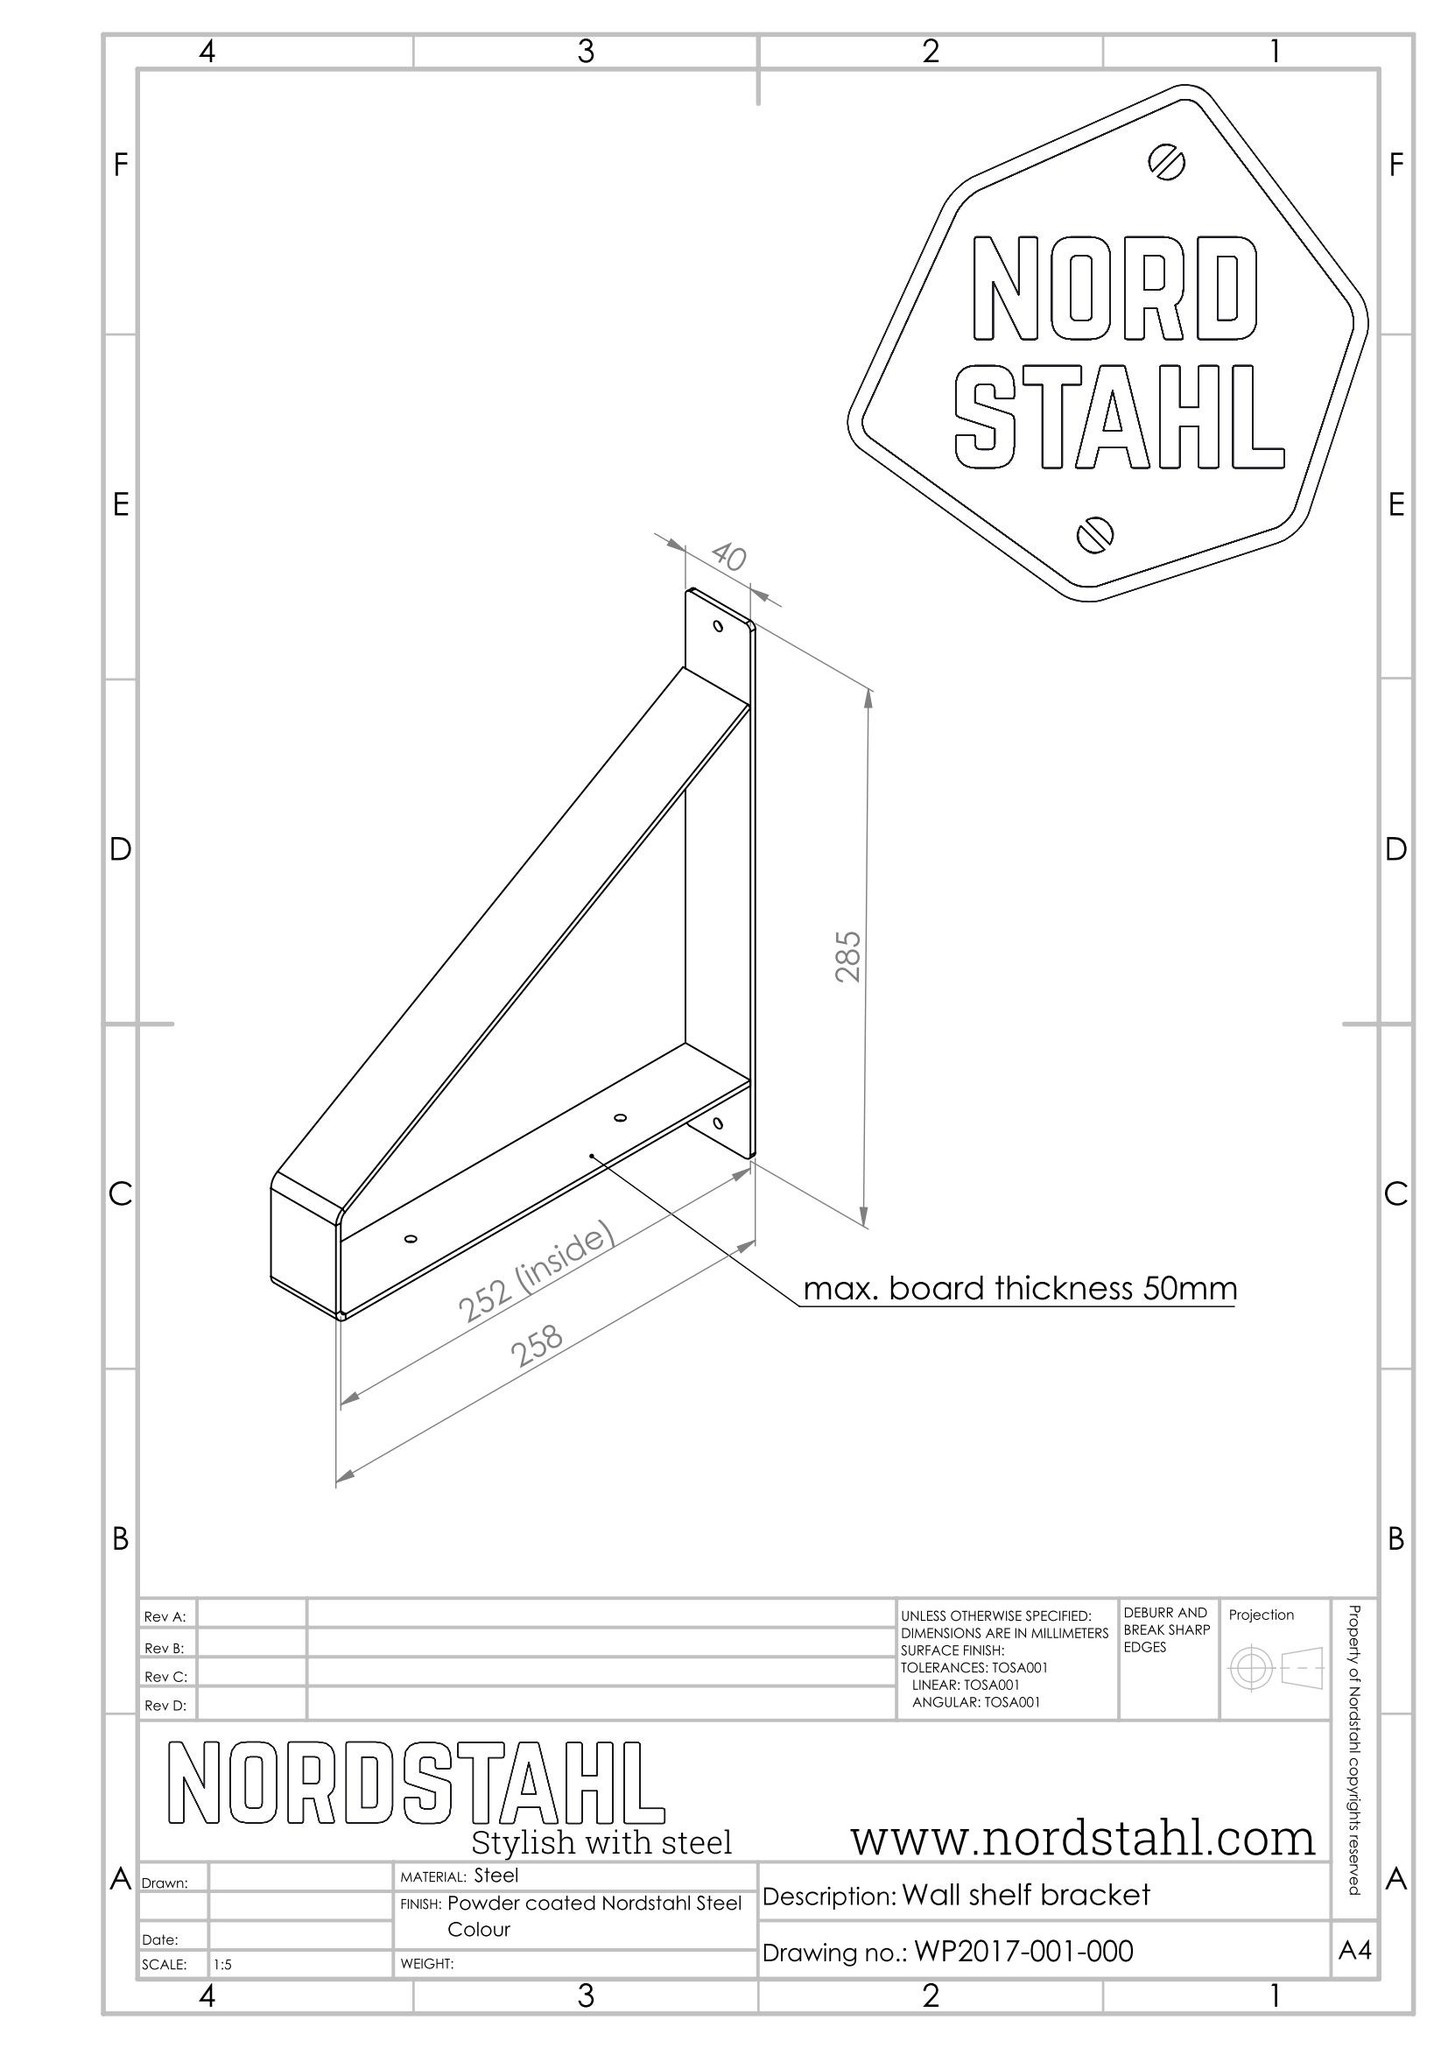 Nordstahl Shelf Brackets technische tekening